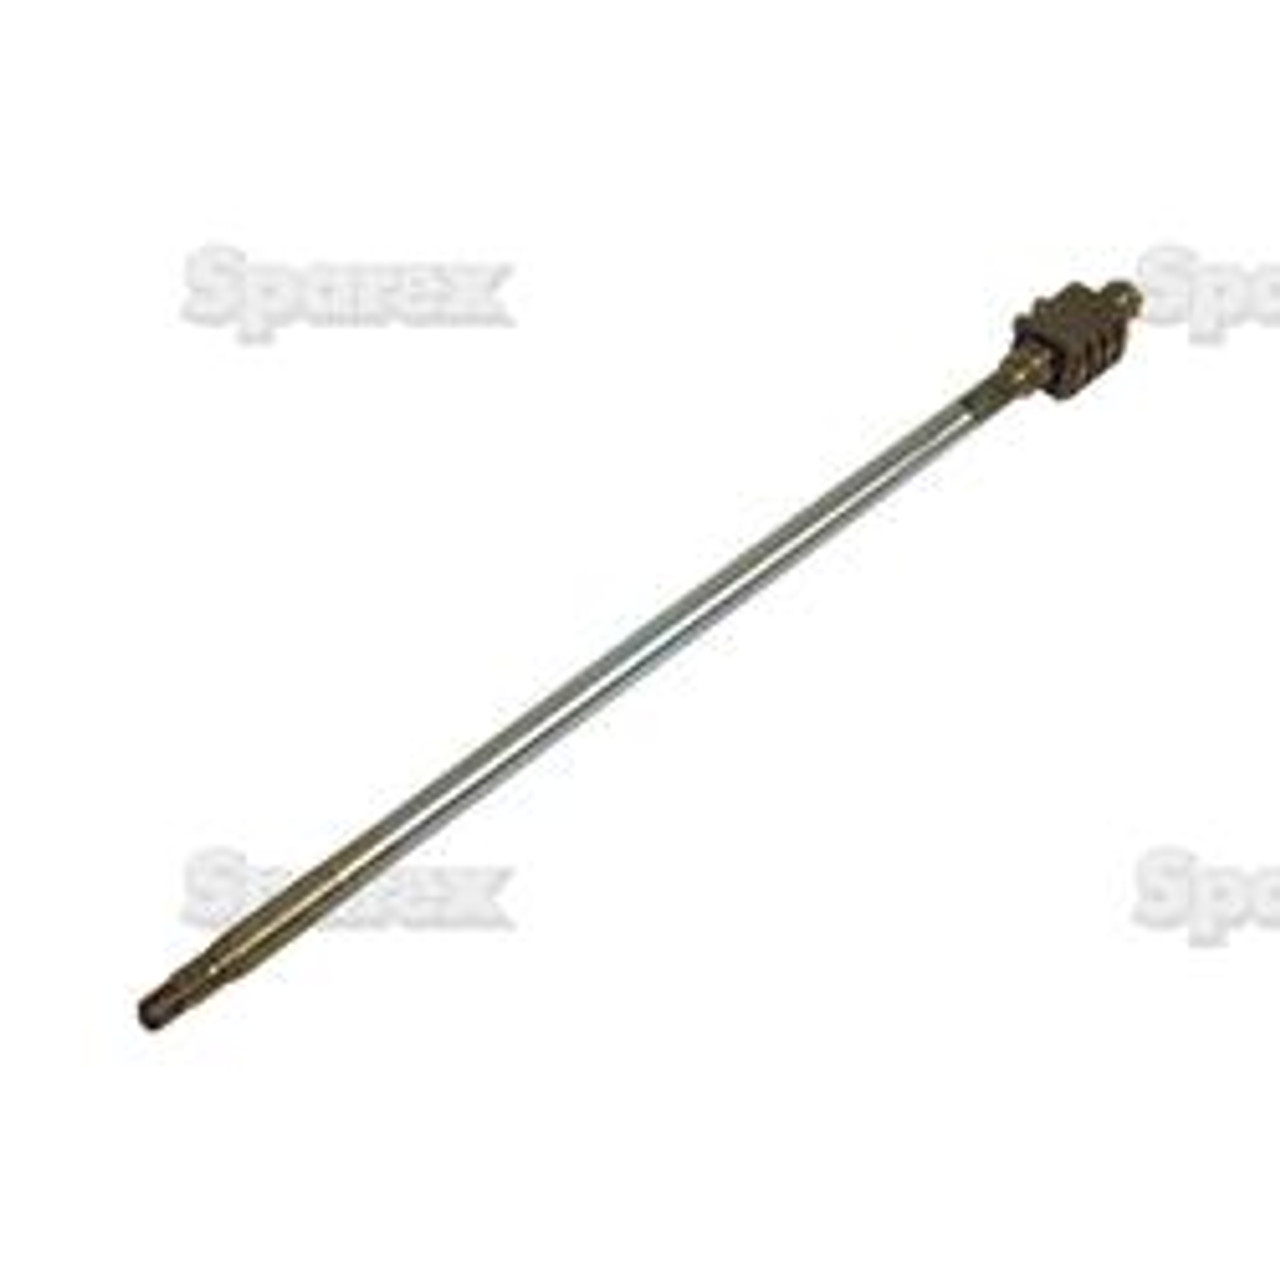 New Yanmar Steering Shaft Kit 79130-15101, 32120-14750